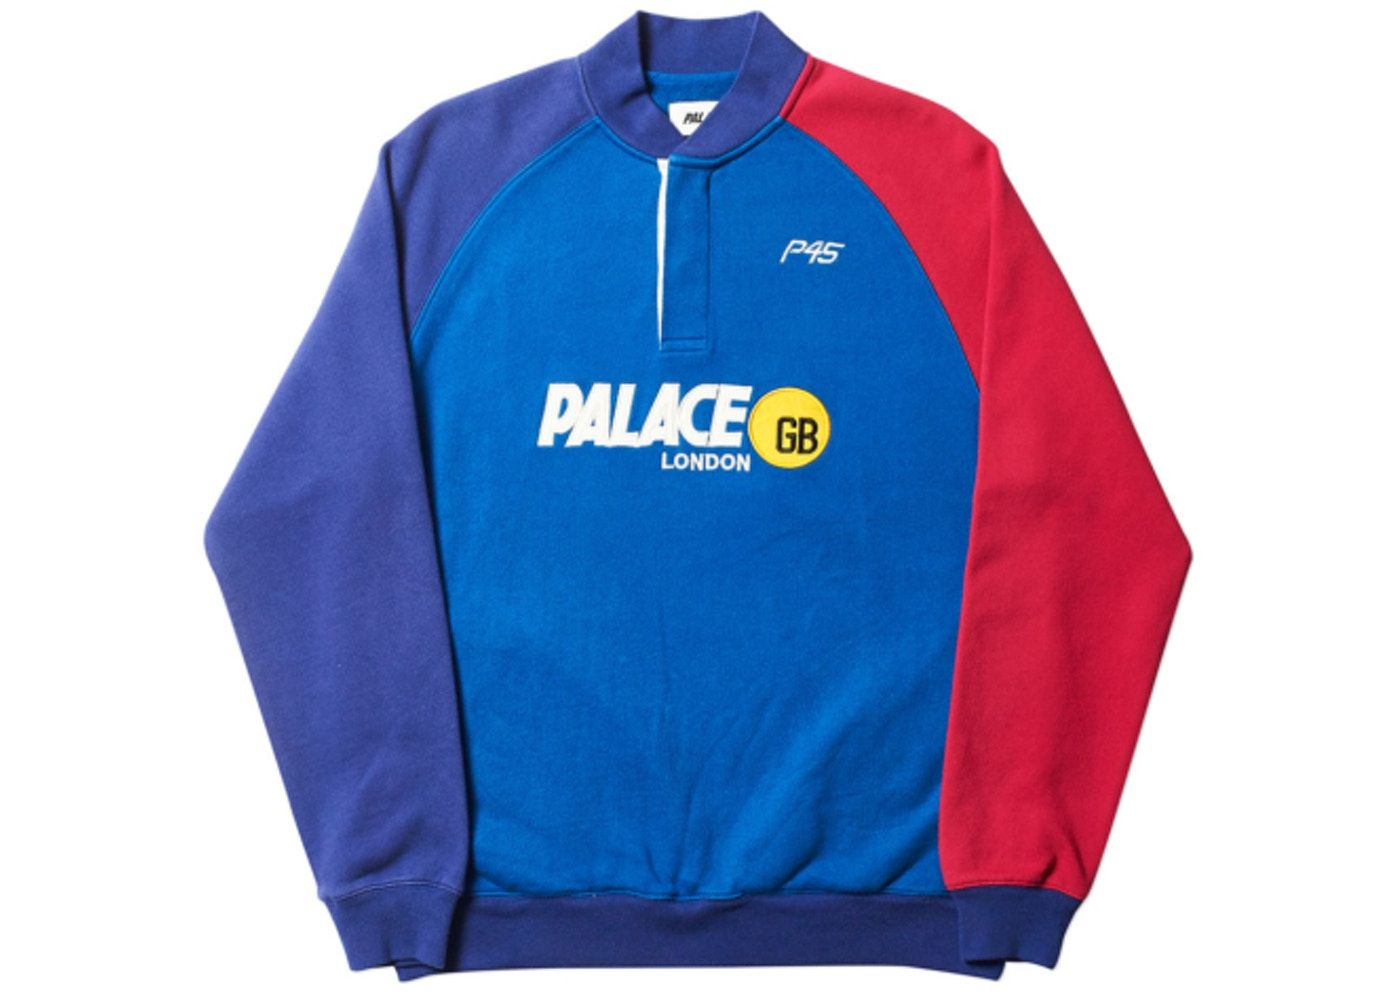 143d50d6 Palace P45-GB Sweat Blue | Color | Palace, Blue, Adidas jacket